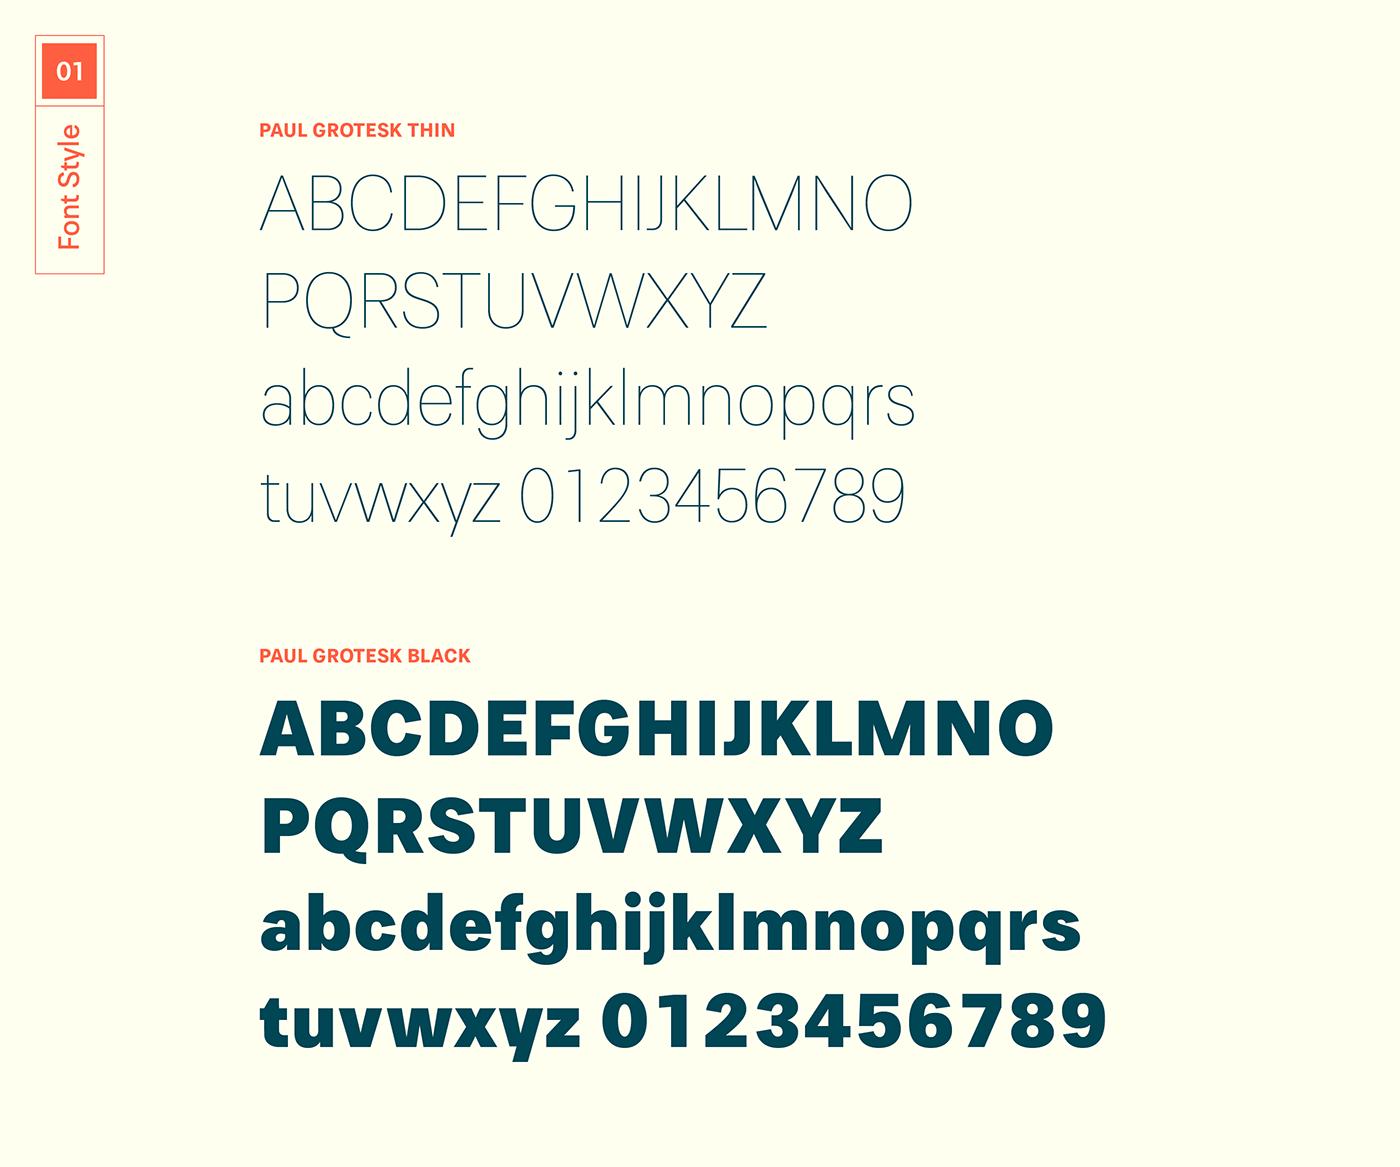 Paul Grotesk Sans Serif Typeface-3